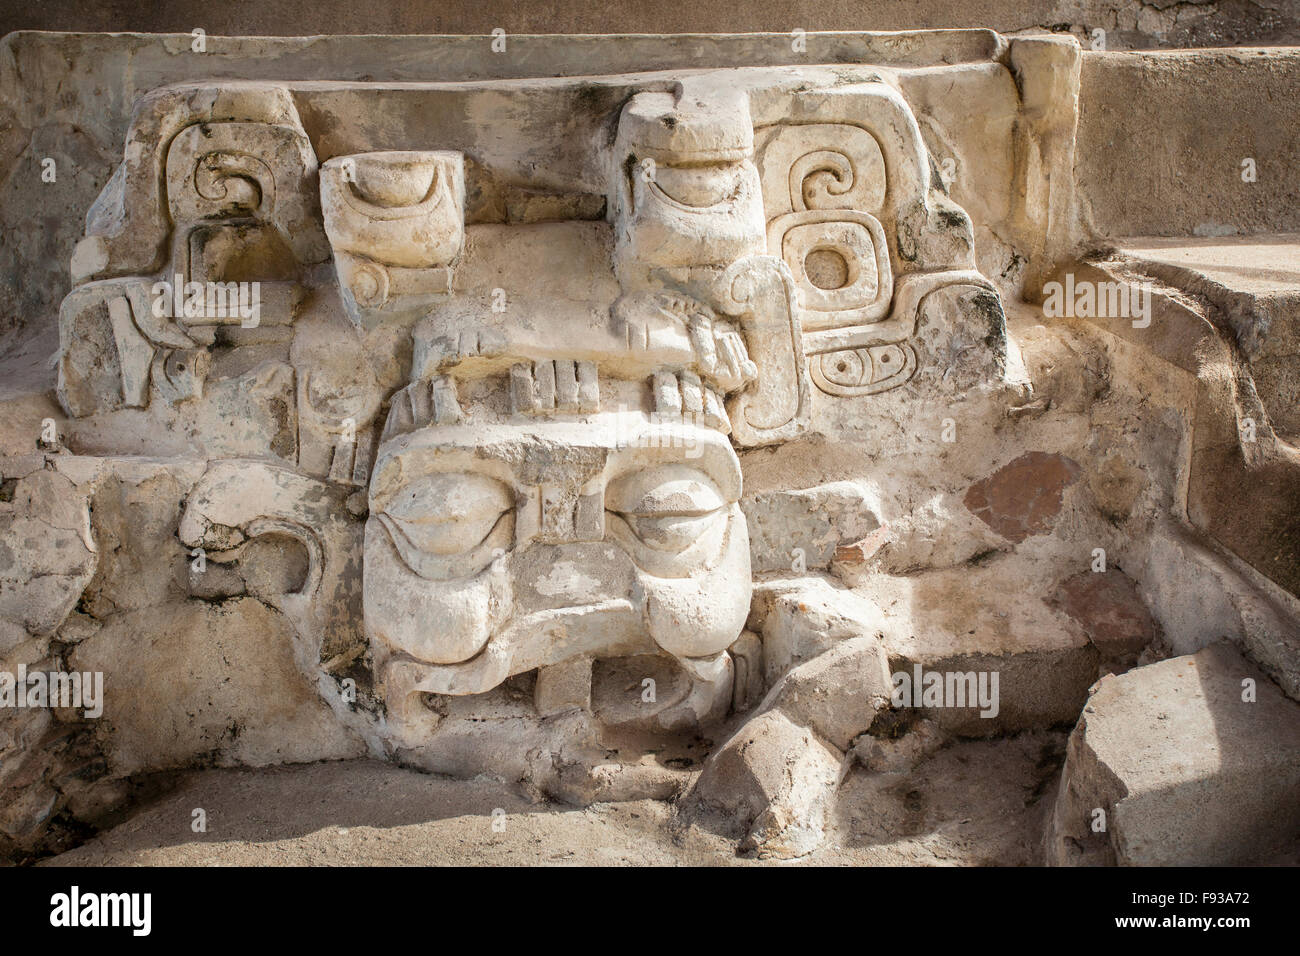 Mascaron at the Mayan ruins of Comalcalco, Tabasco, Mexico. - Stock Image